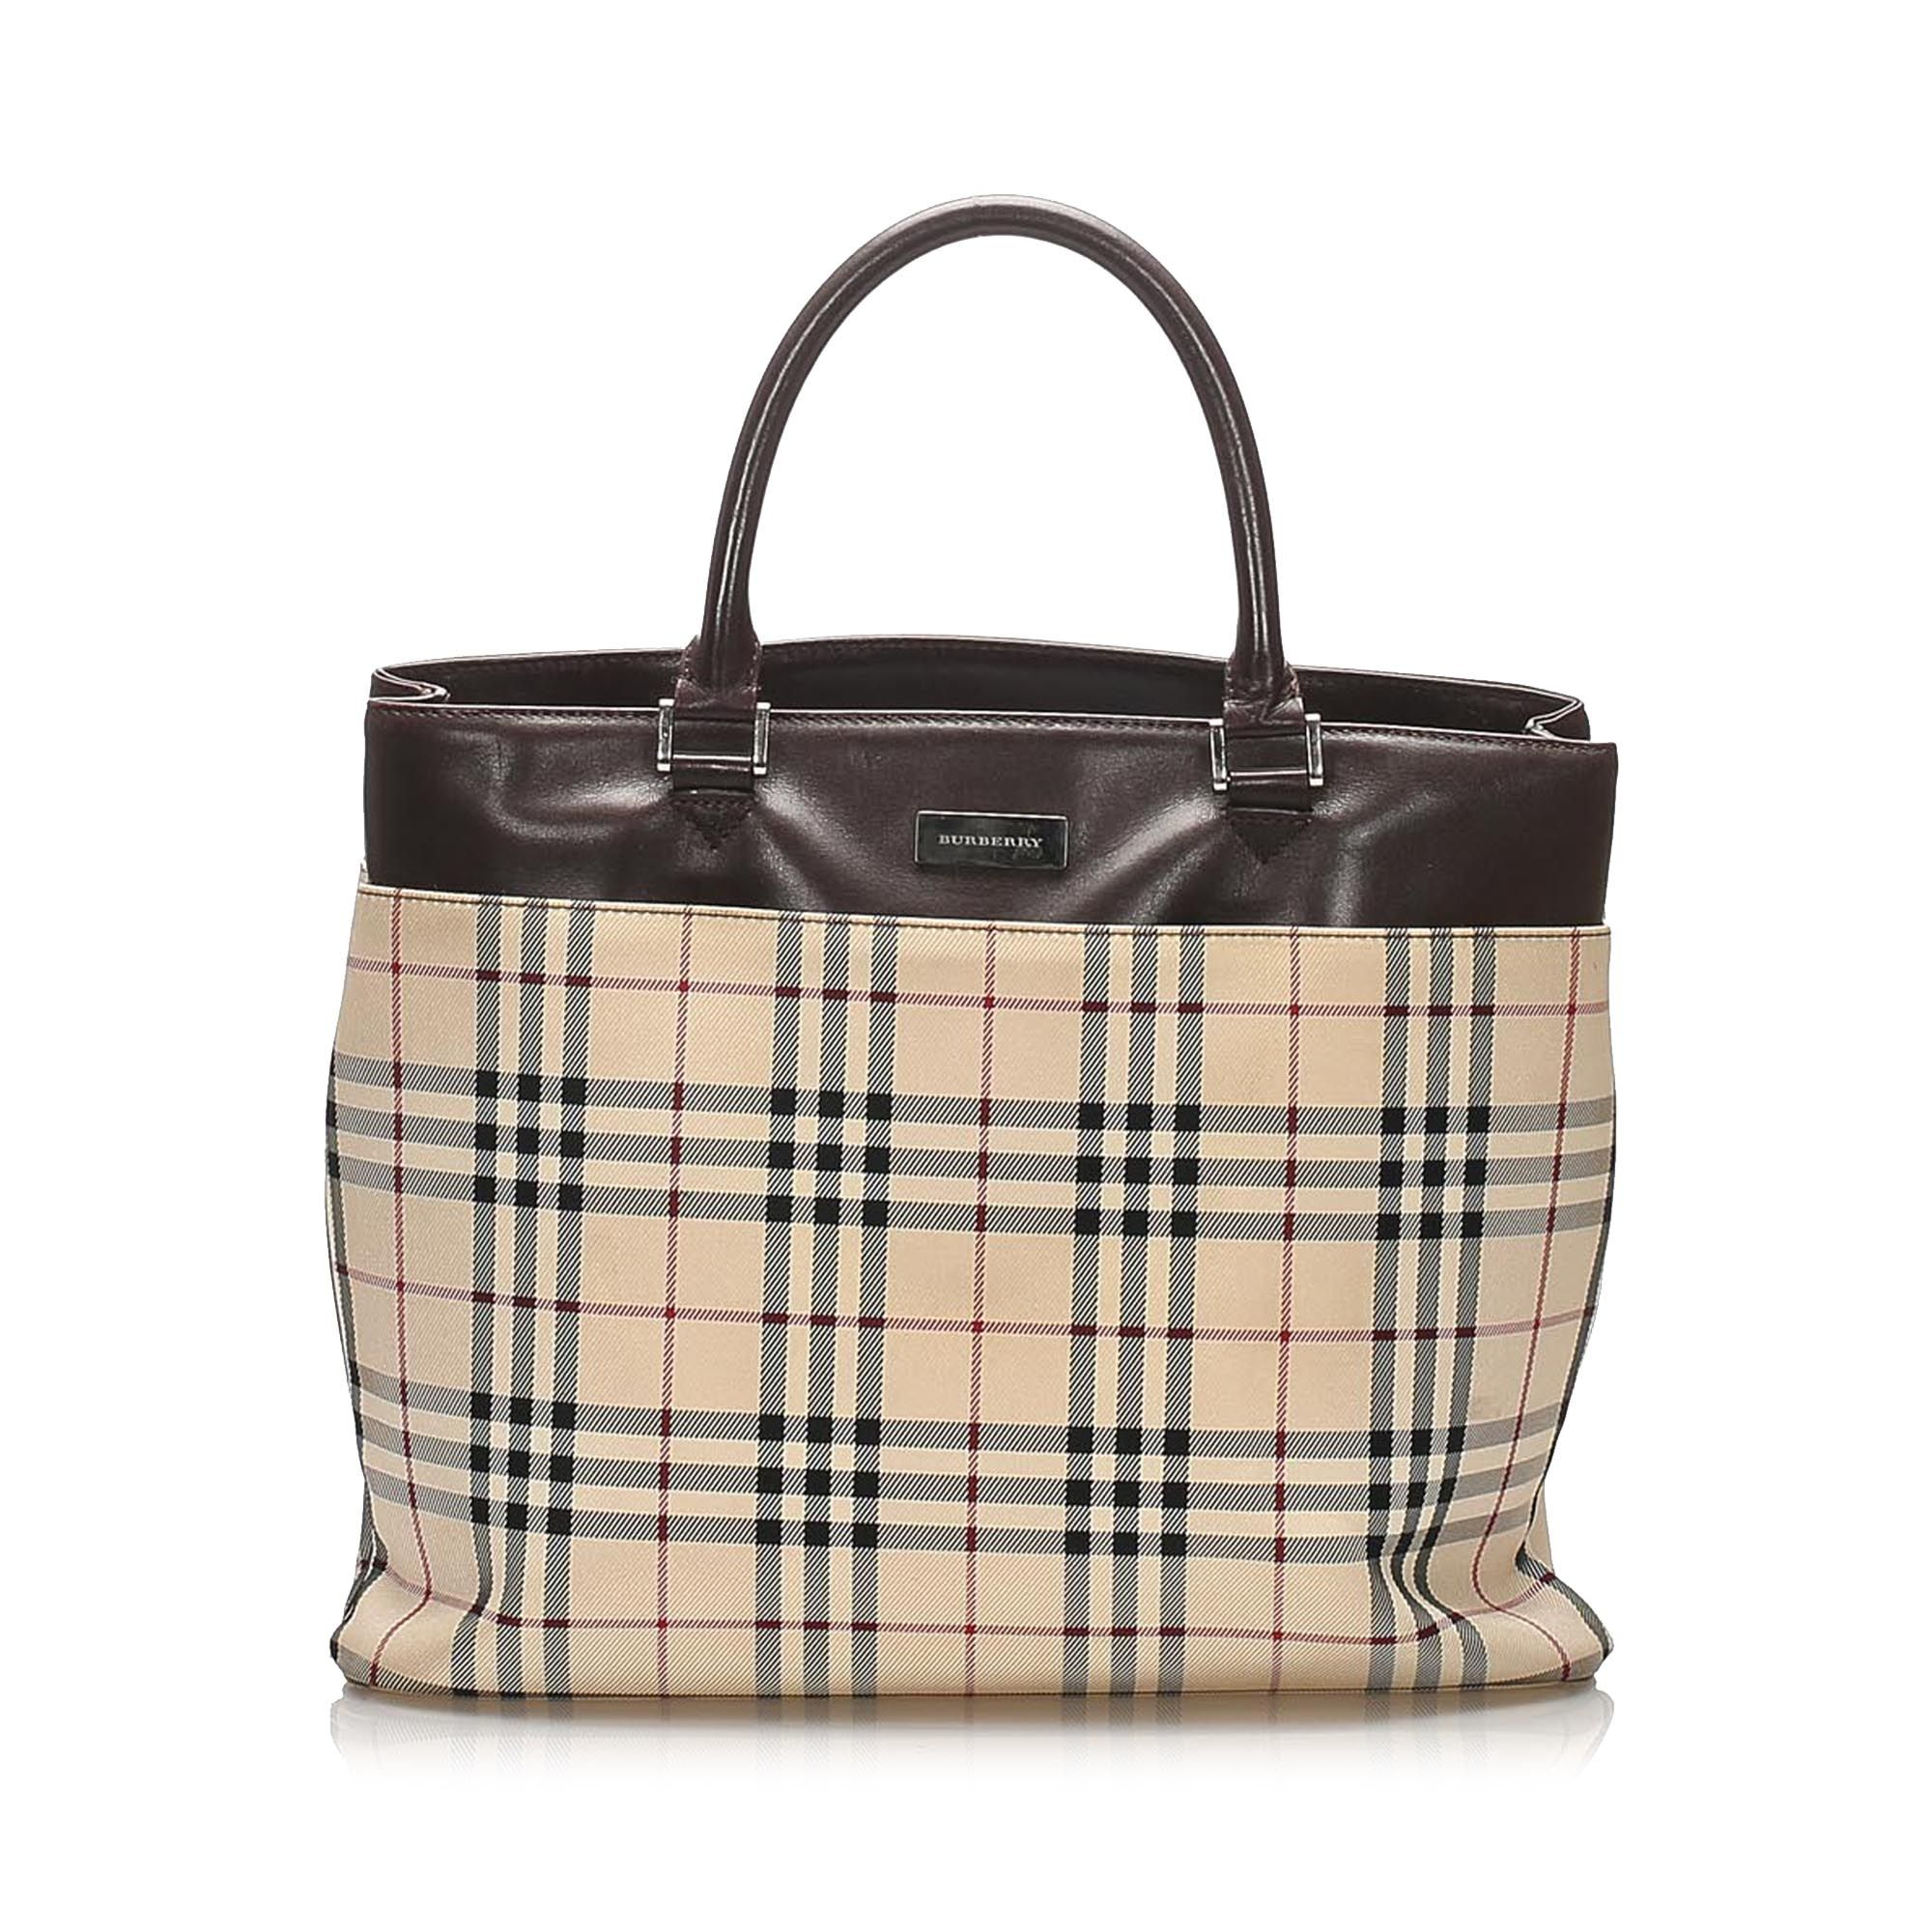 Vintage Burberry House Check Canvas Handbag Brown